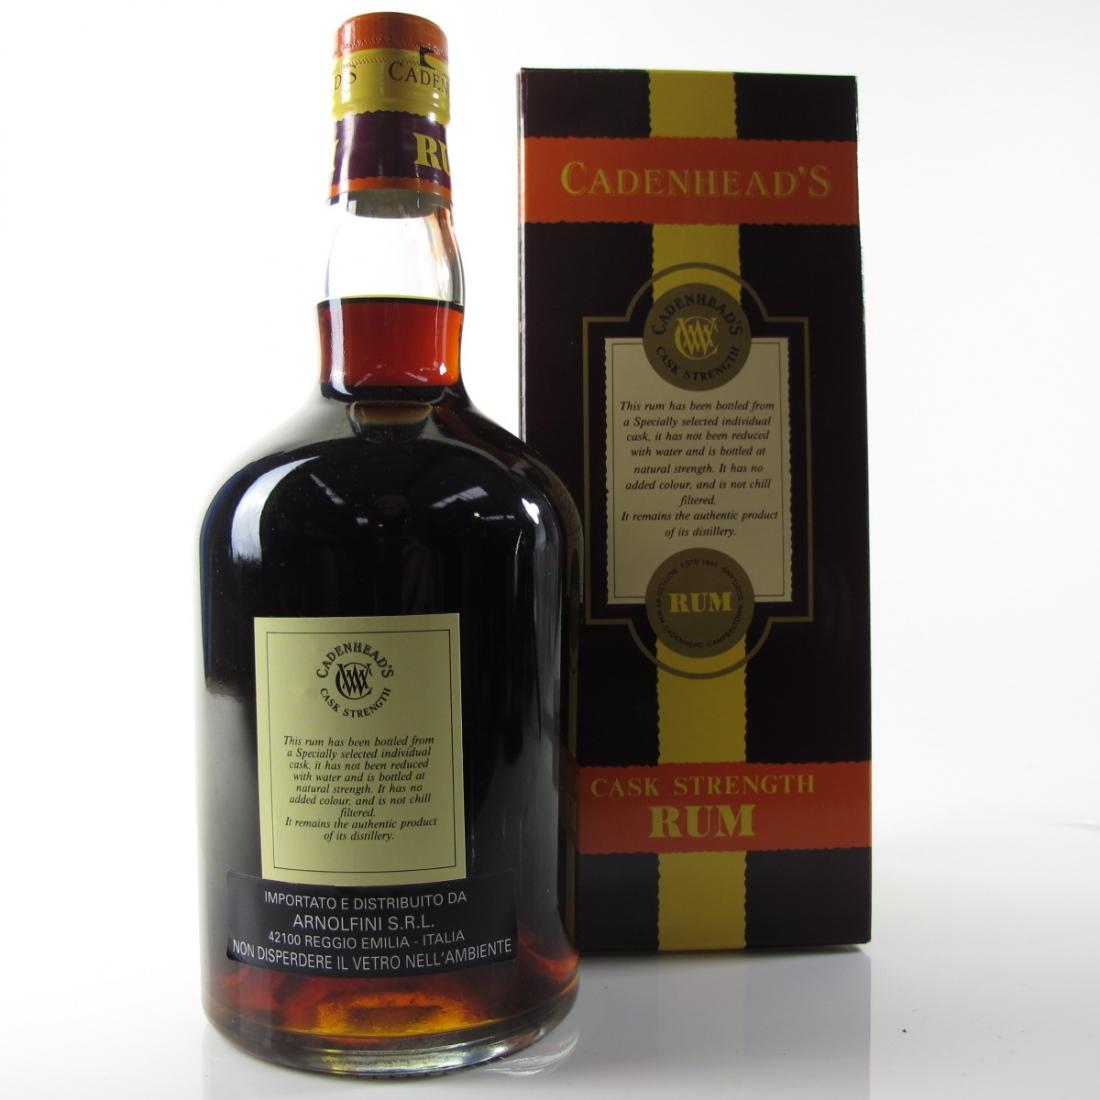 Uitvlugt 1974 Cadenheads 30 Year Old Demerara Rum